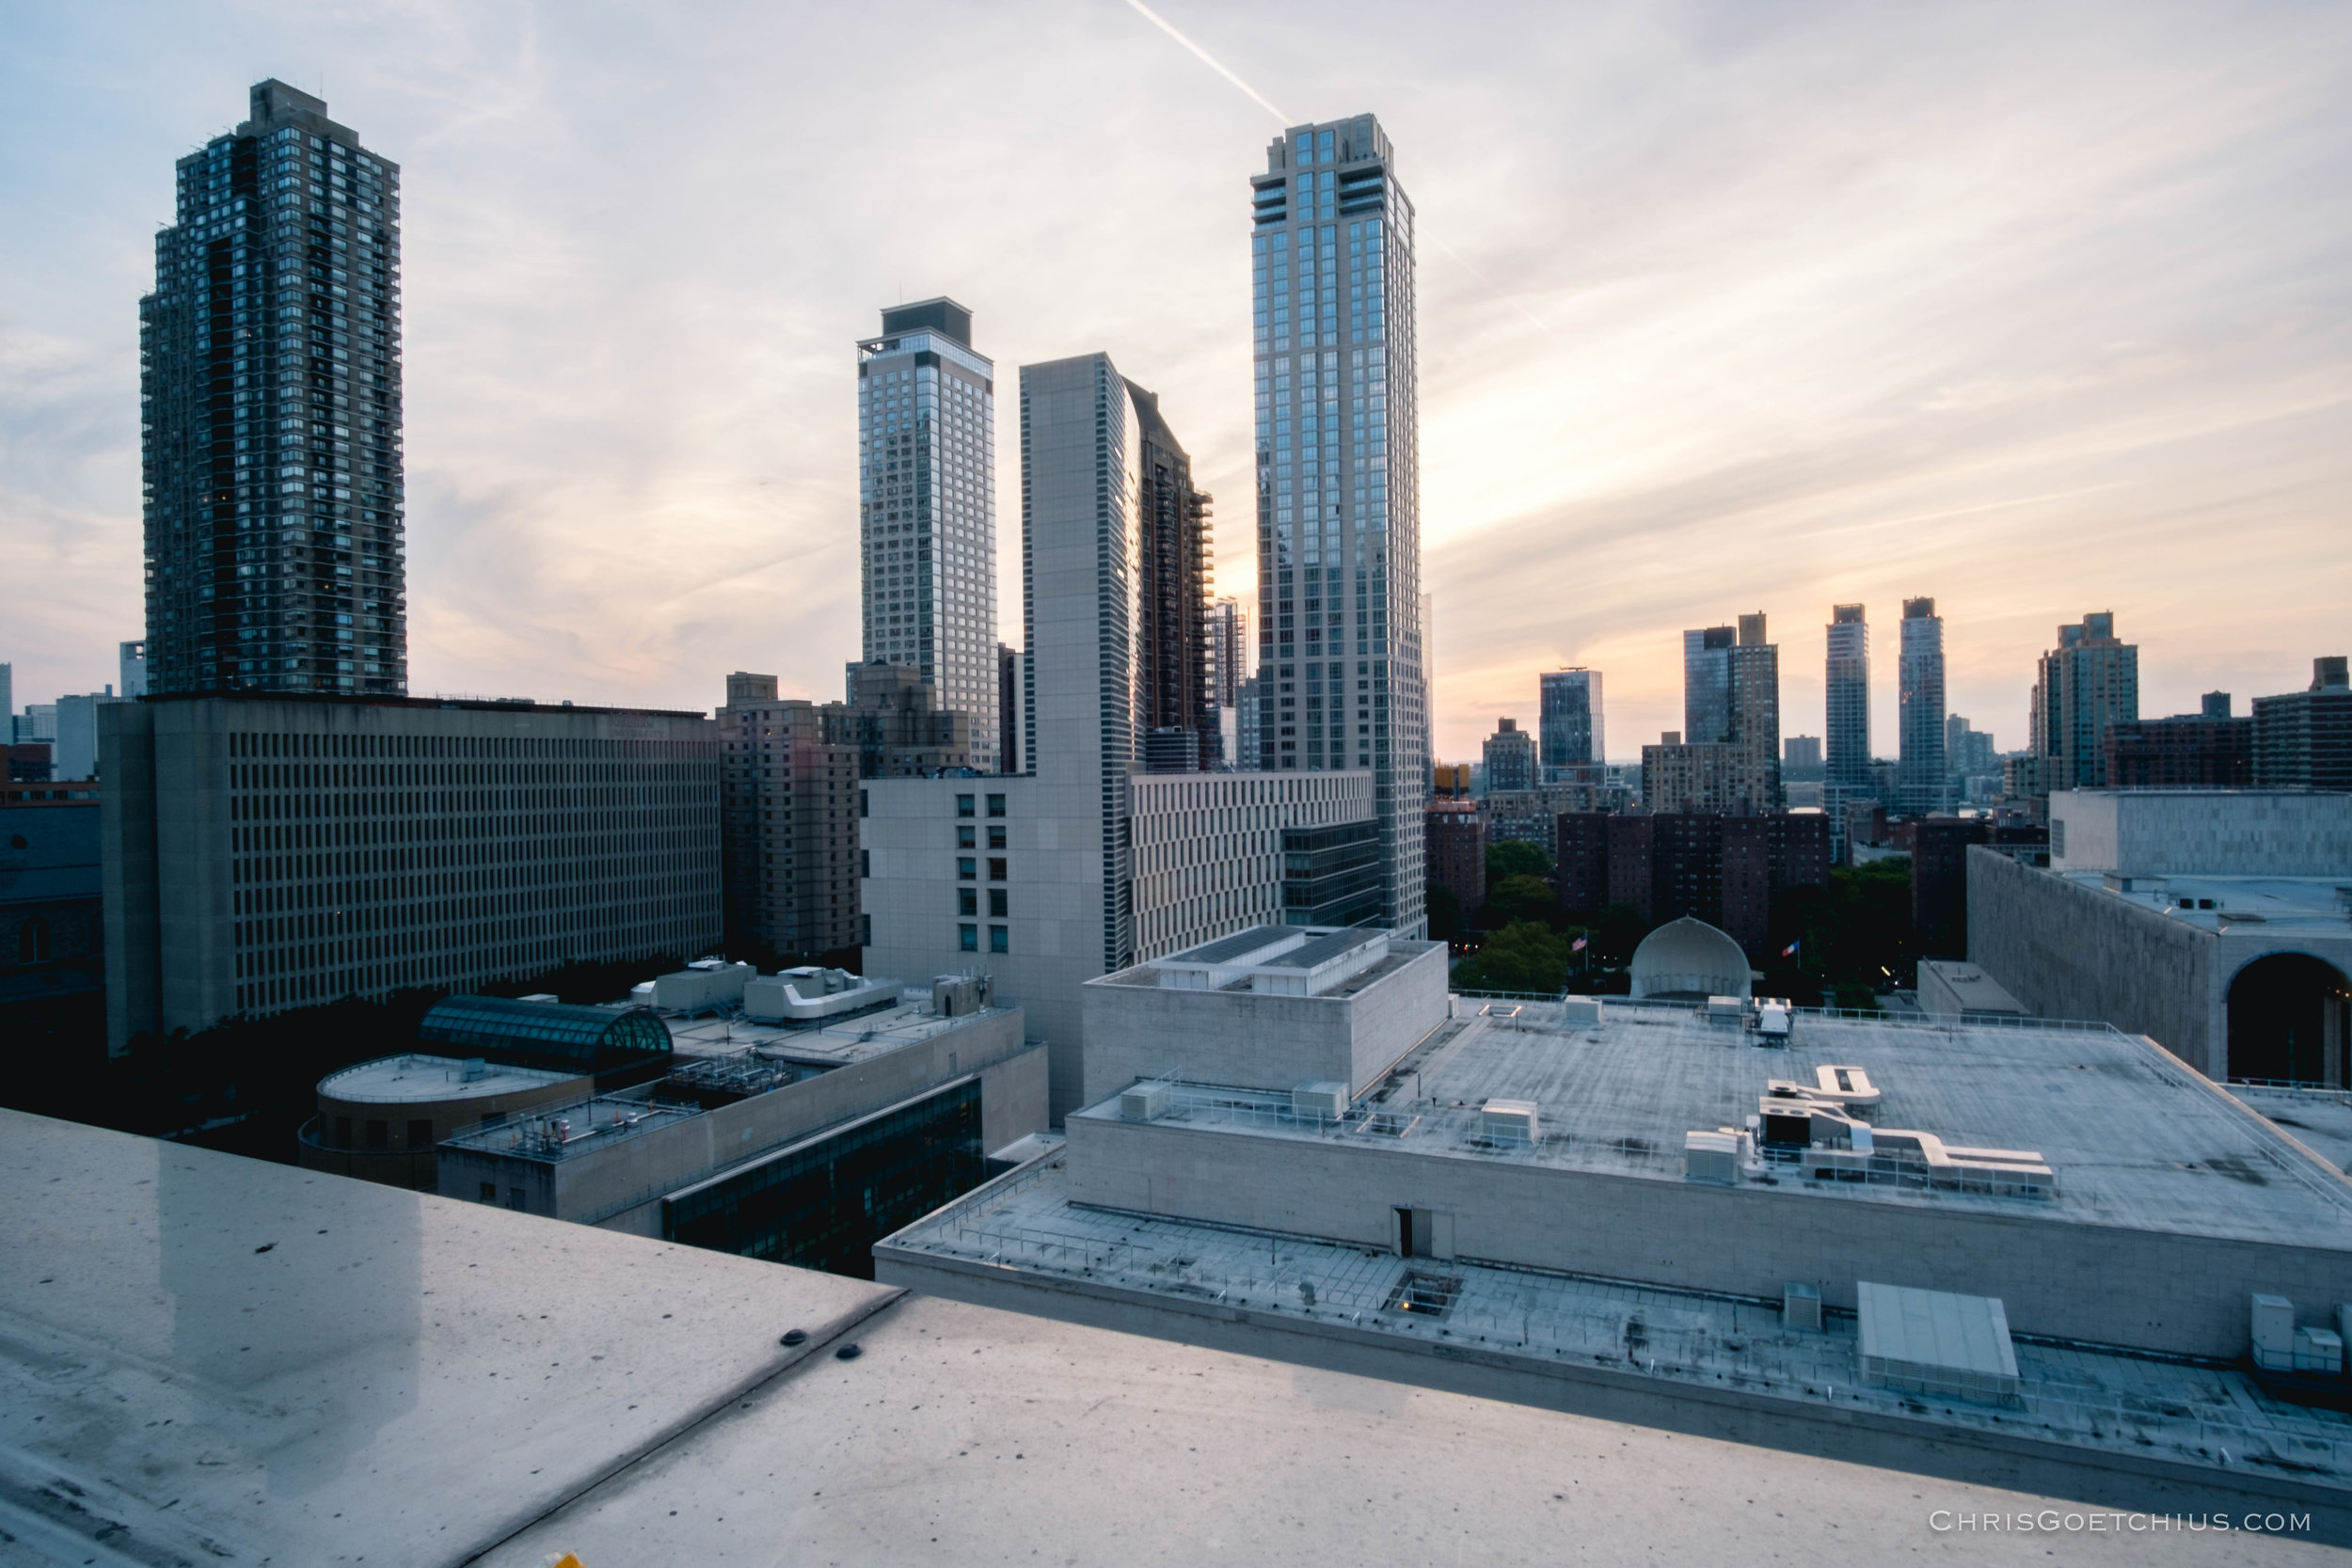 NYC Rename - 00282 - Chris Goetchius 2017.jpg